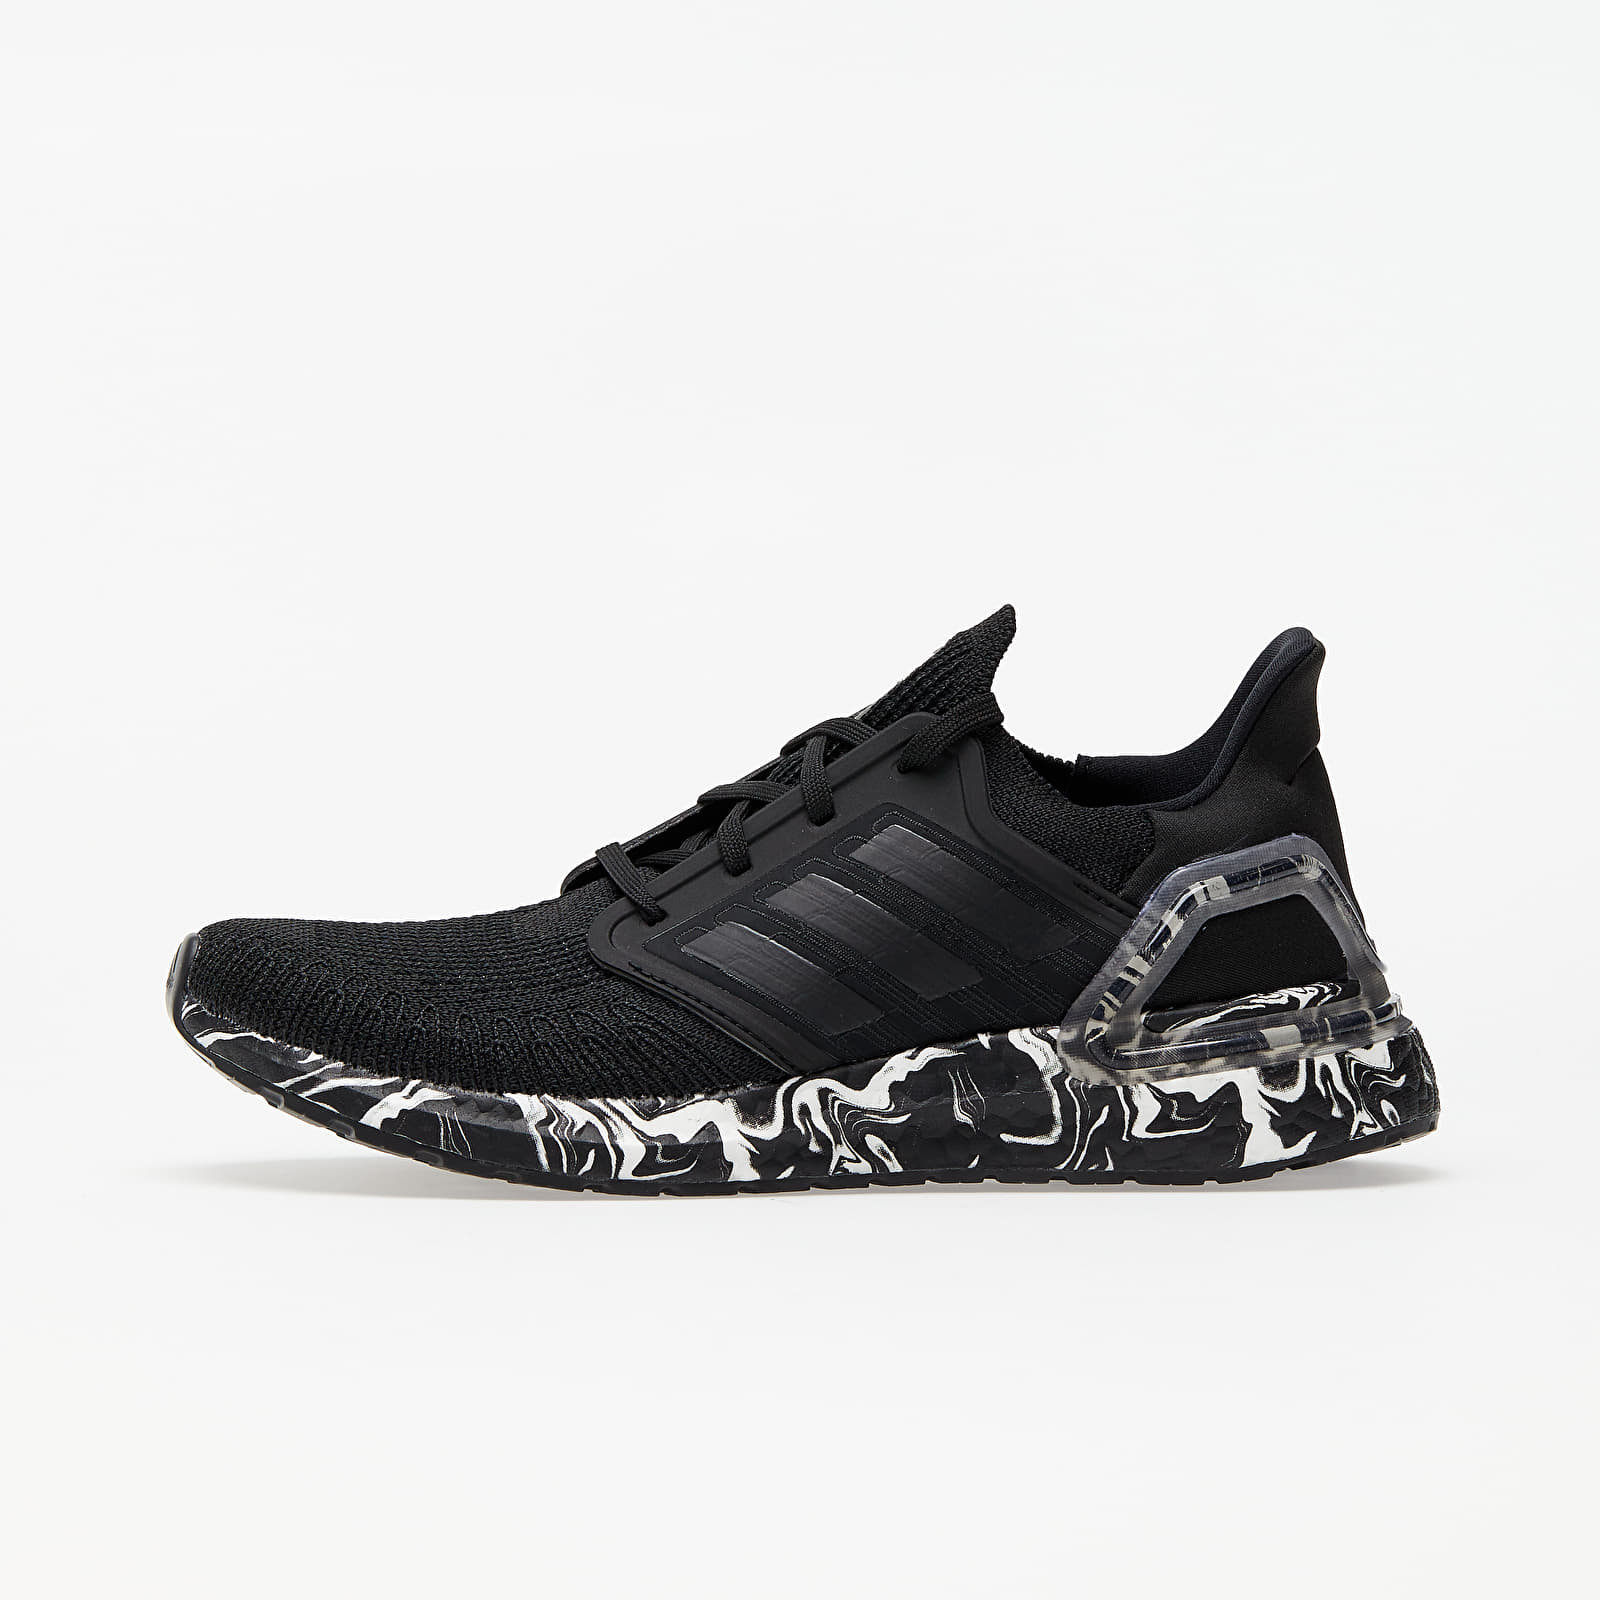 adidas UltraBOOST 20 W Core Black/ Core Black/ Ftw White FW5720